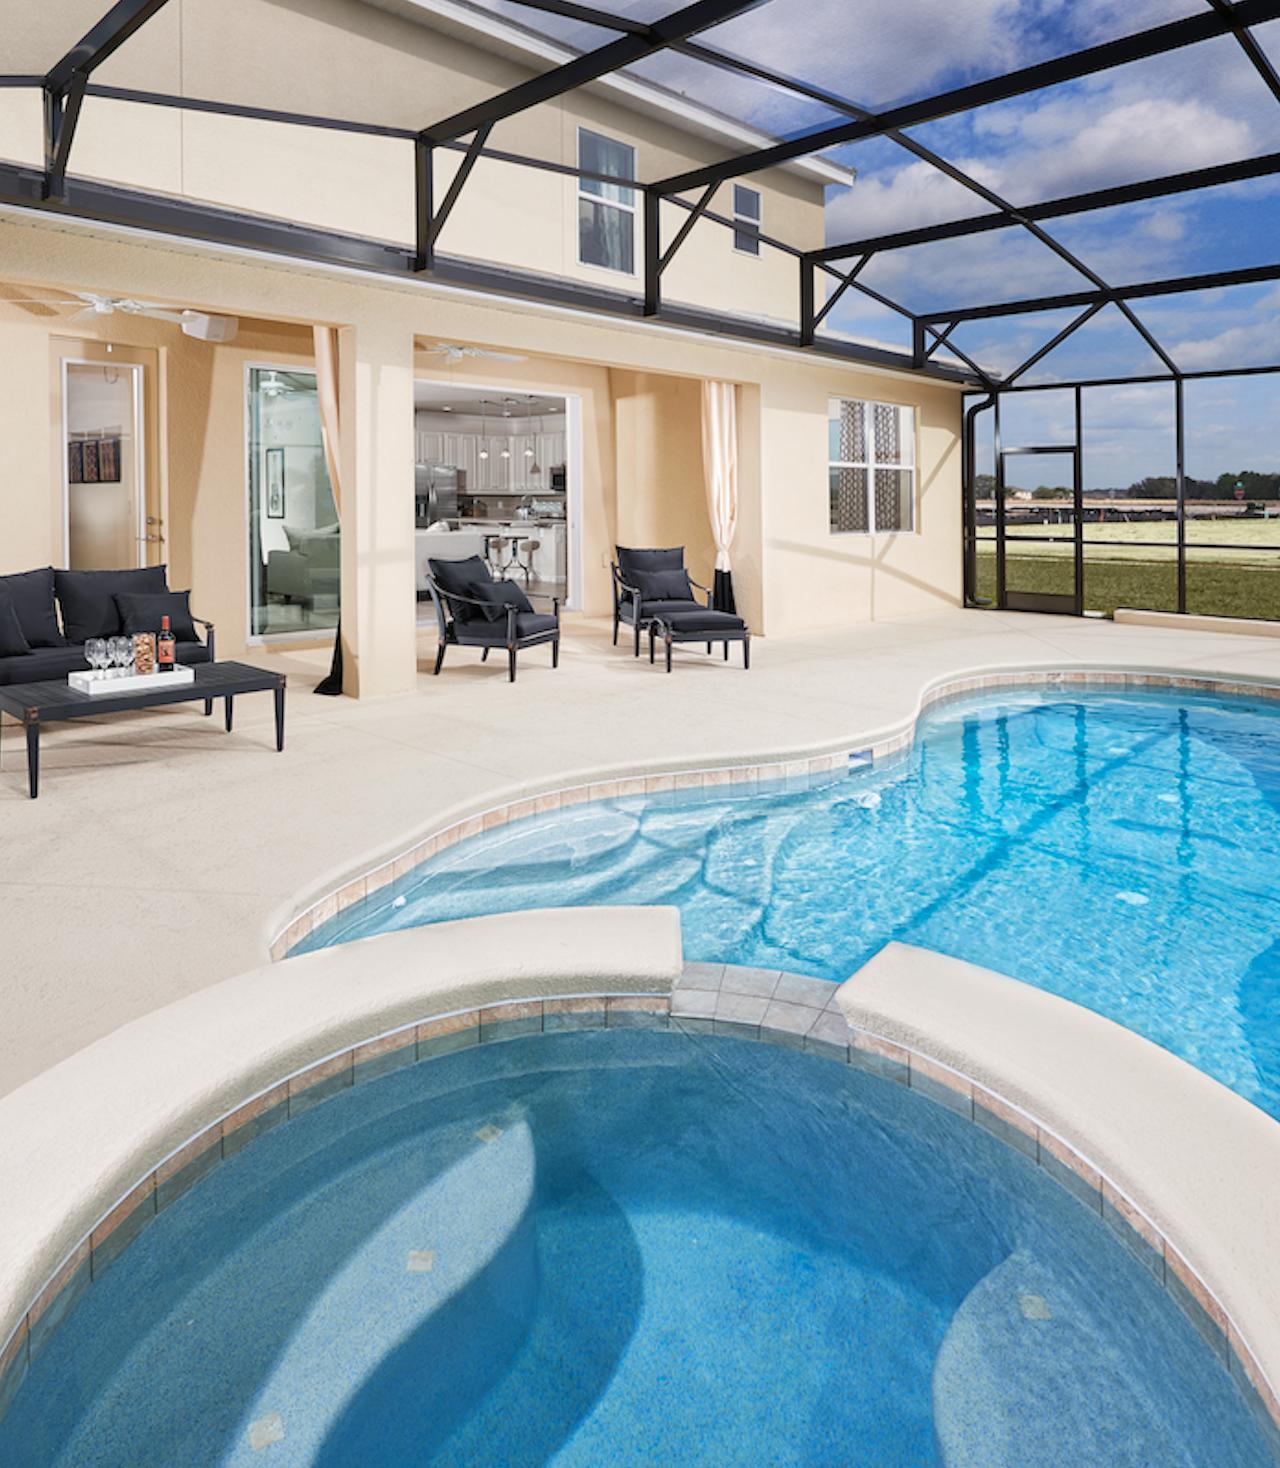 featured image of Sonoma at Bellavida Resort